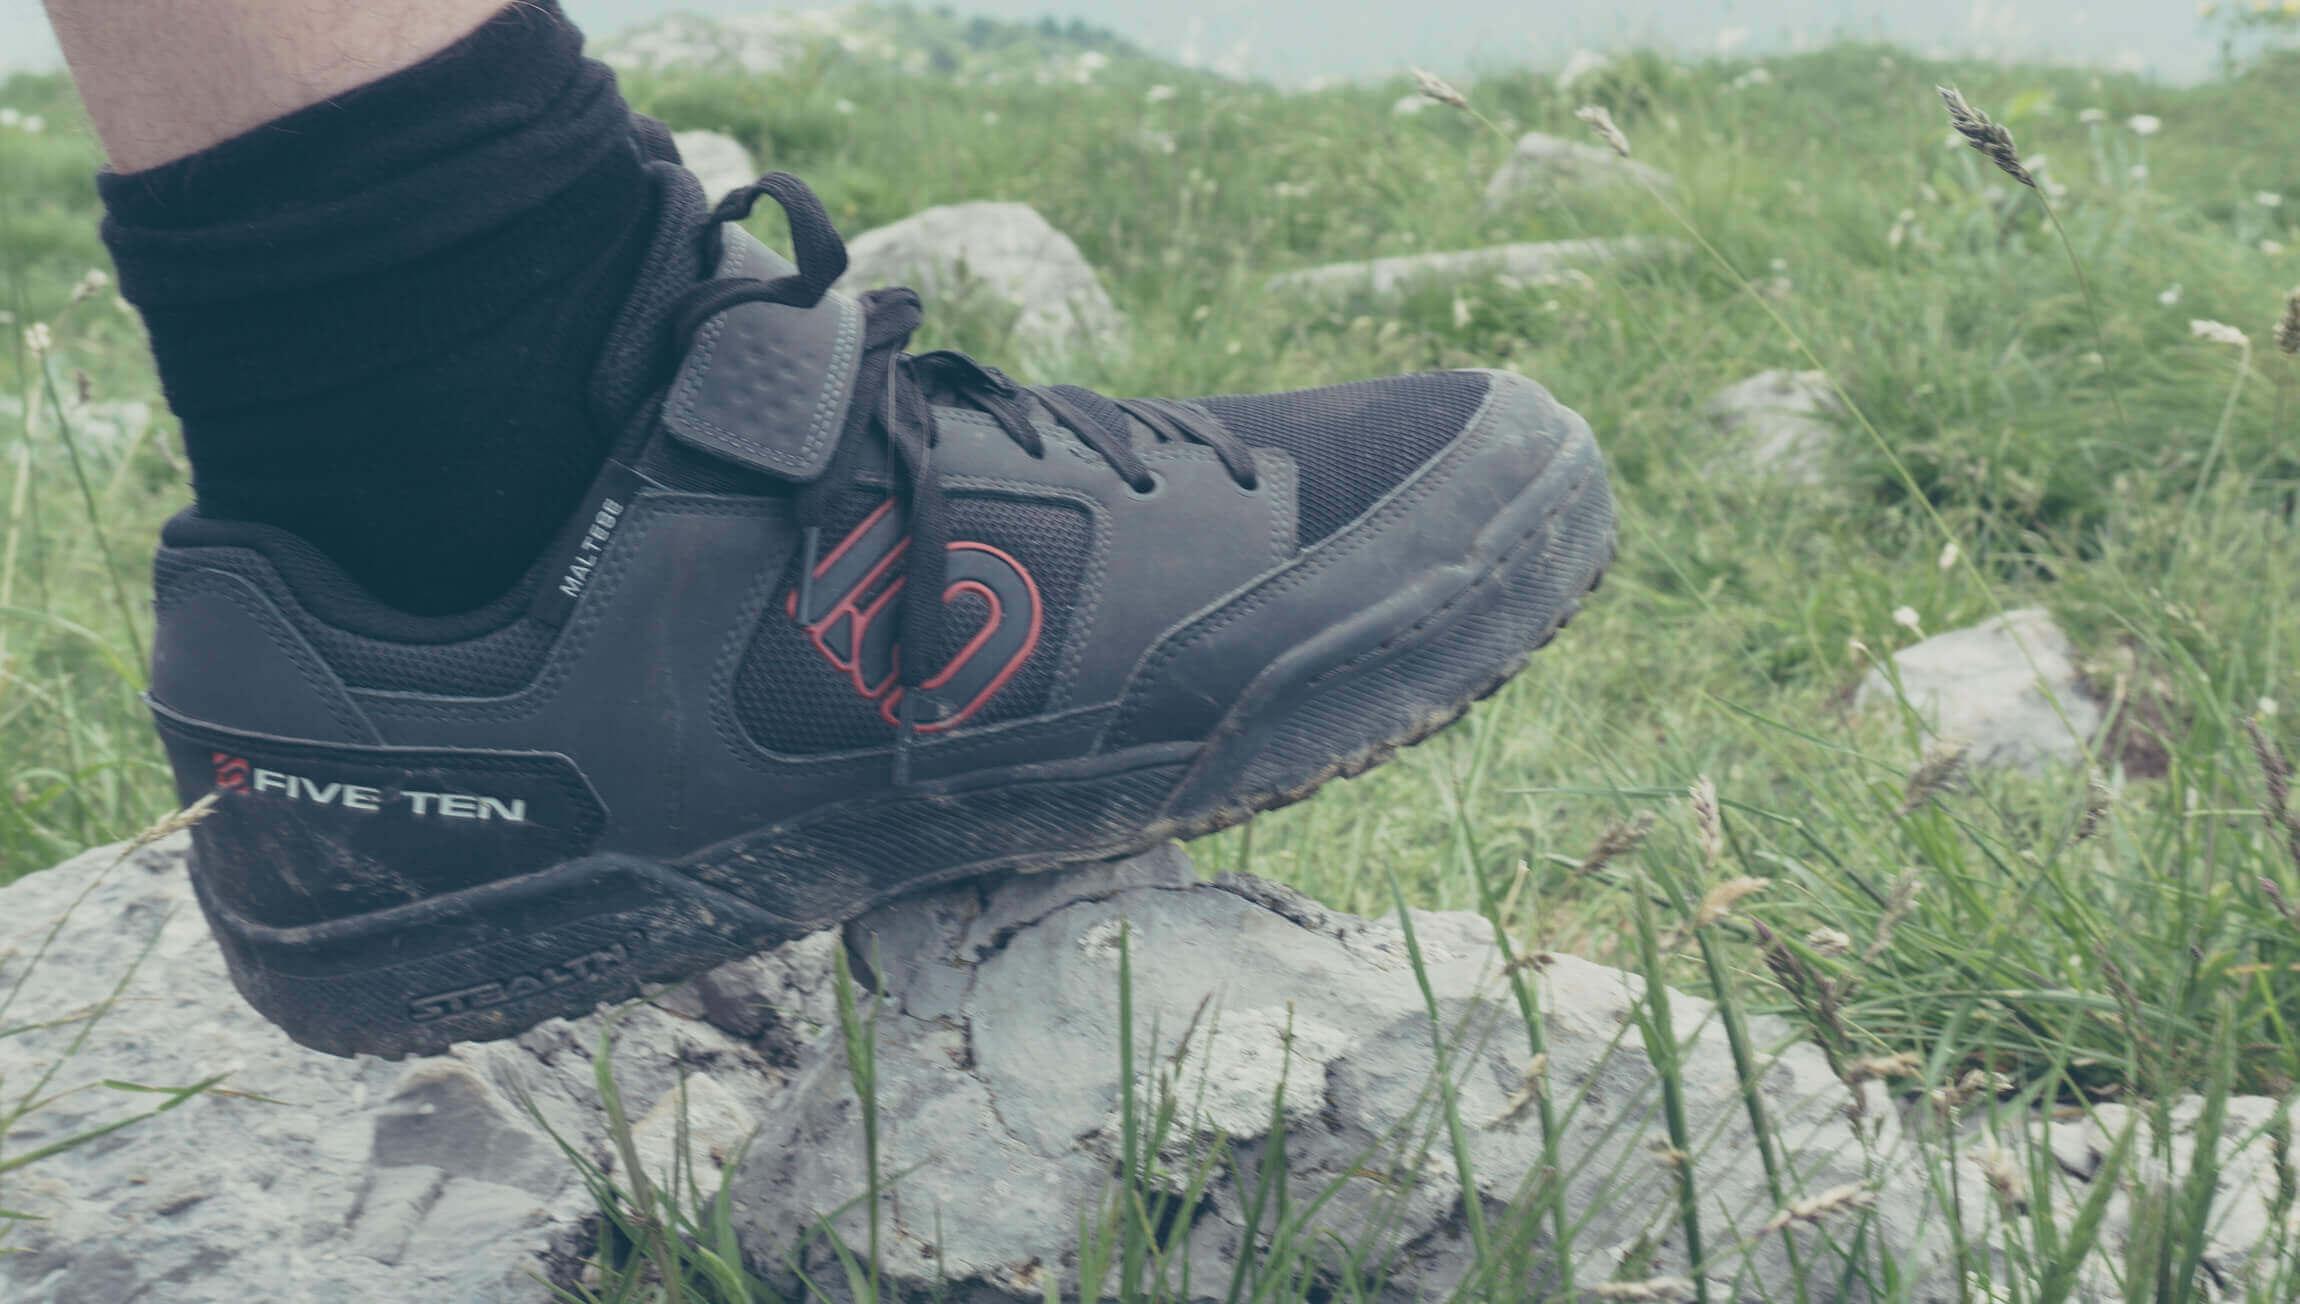 Five Ten Maltese Falcon MTB Klick Schuhe im Test   Federweg